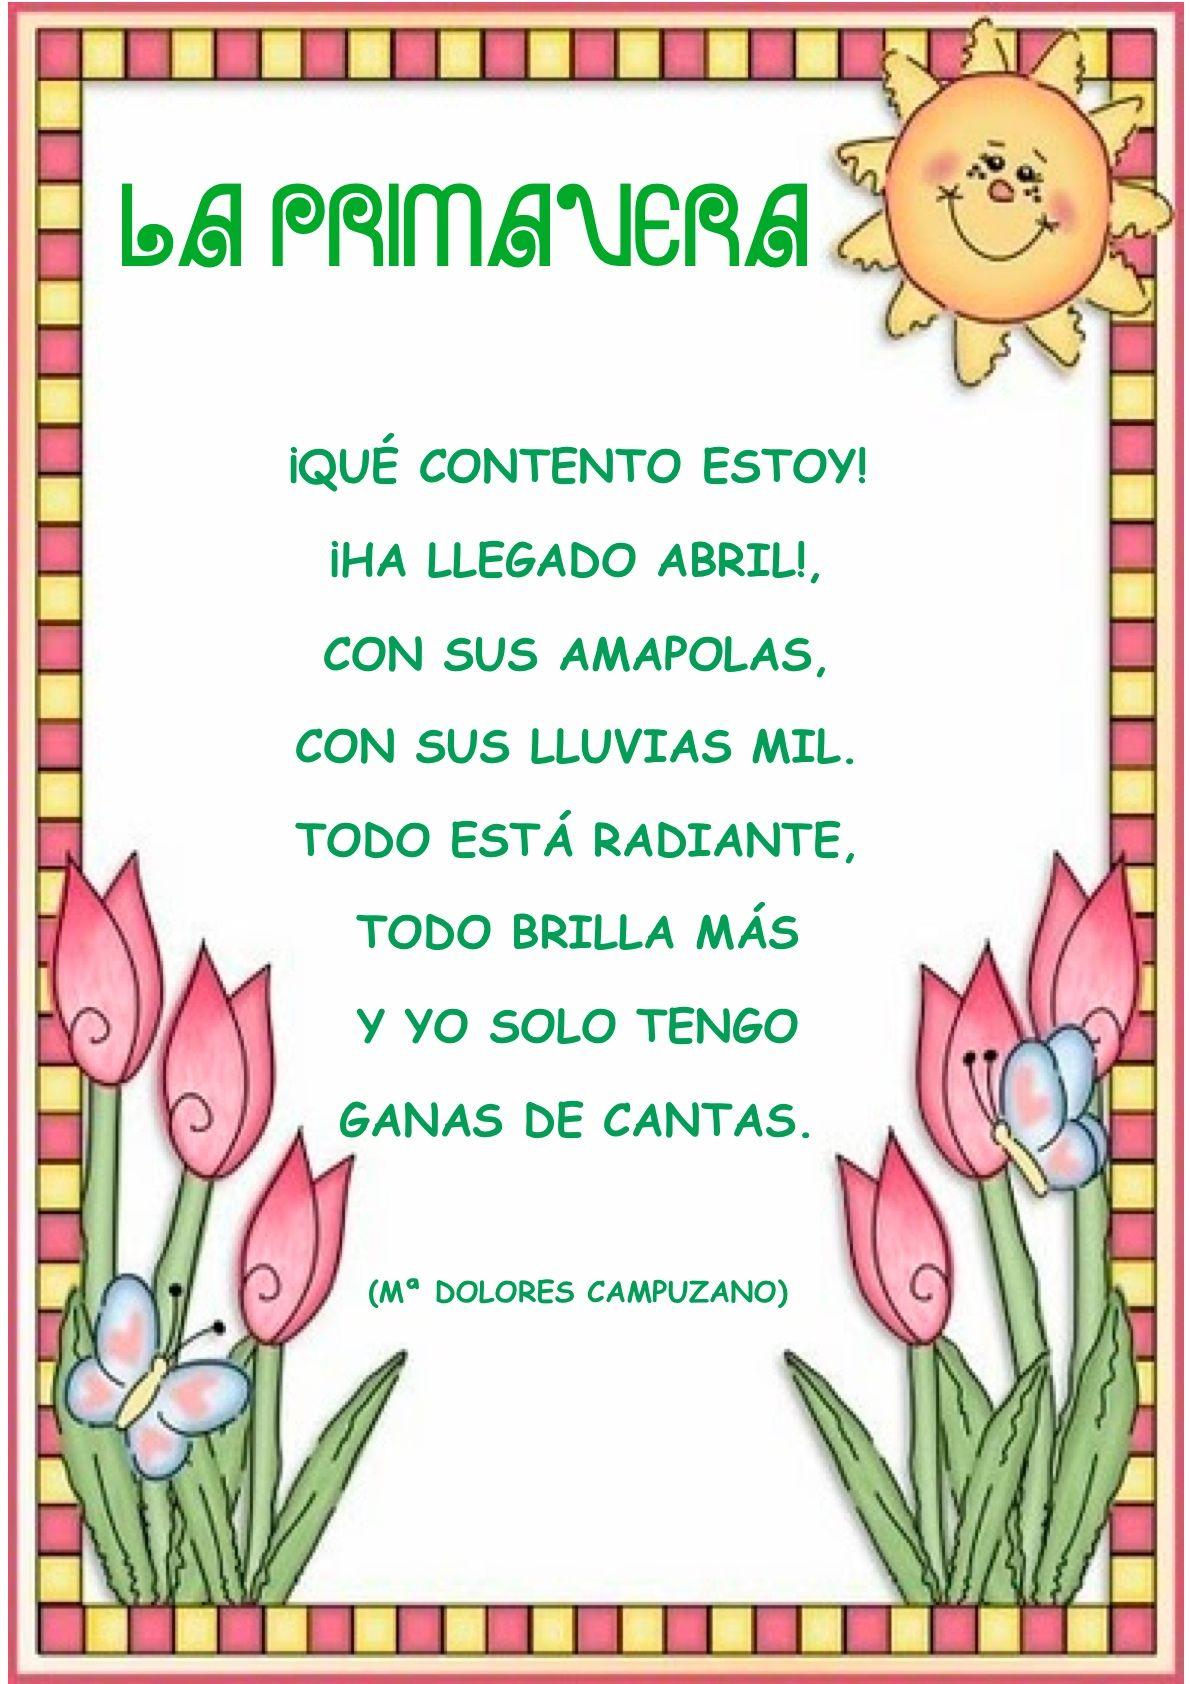 Poesia La Primavera Poetry Anchor Chart Spanish Songs Elementary Spanish